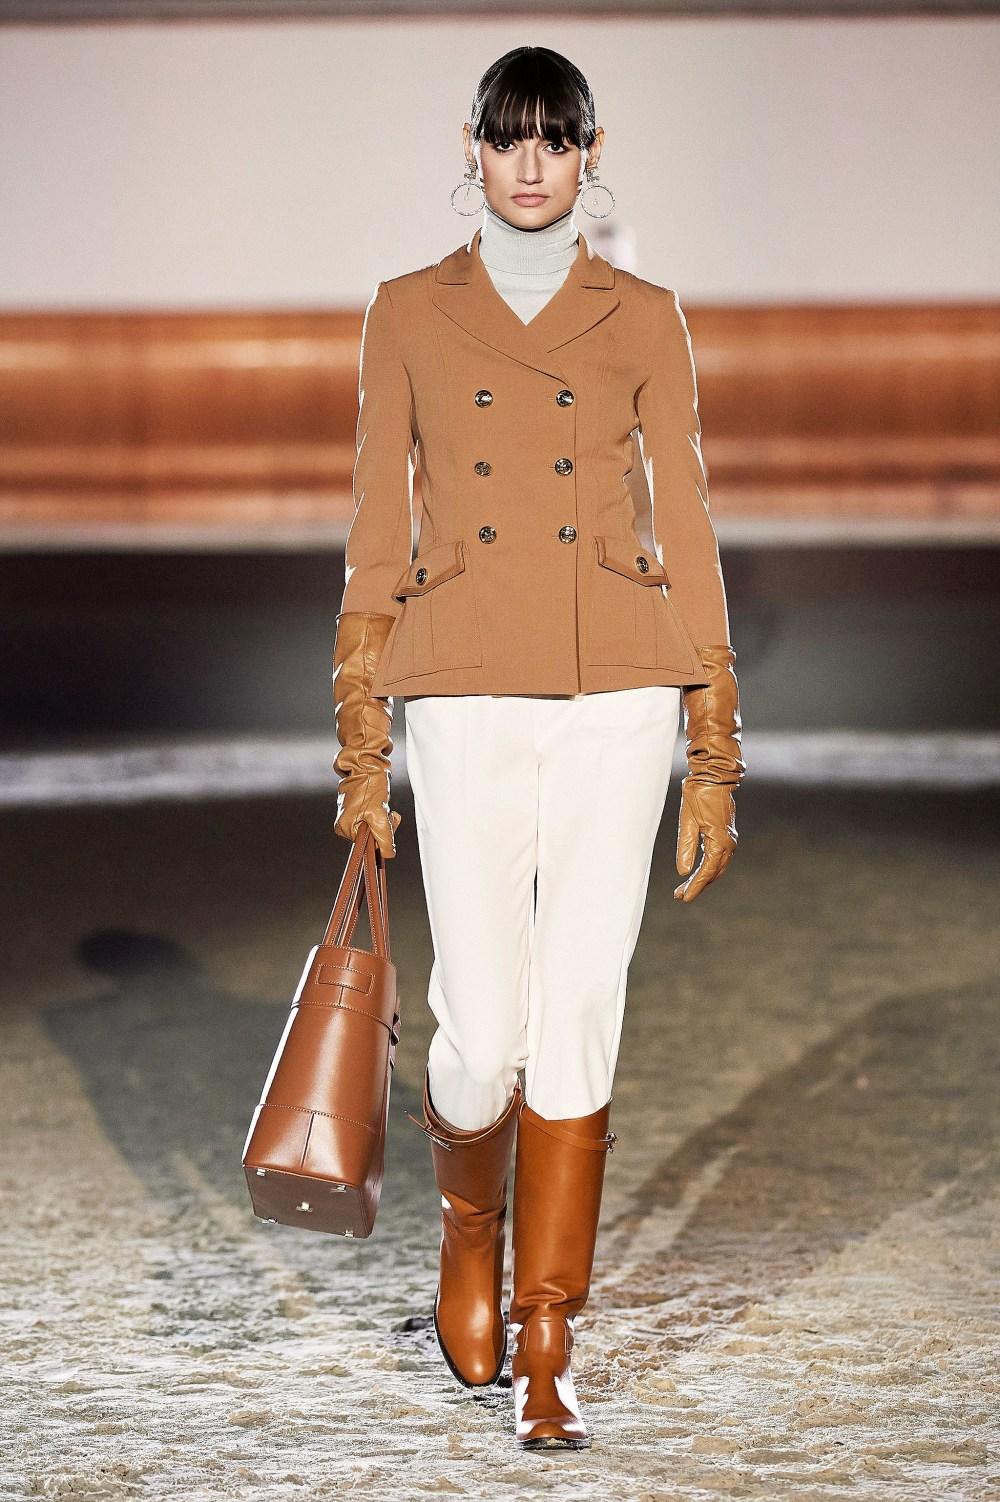 Elisabetta Franchi: Elisabetta Franchi Fall Winter 2021-22 Fashion Show Photo #15